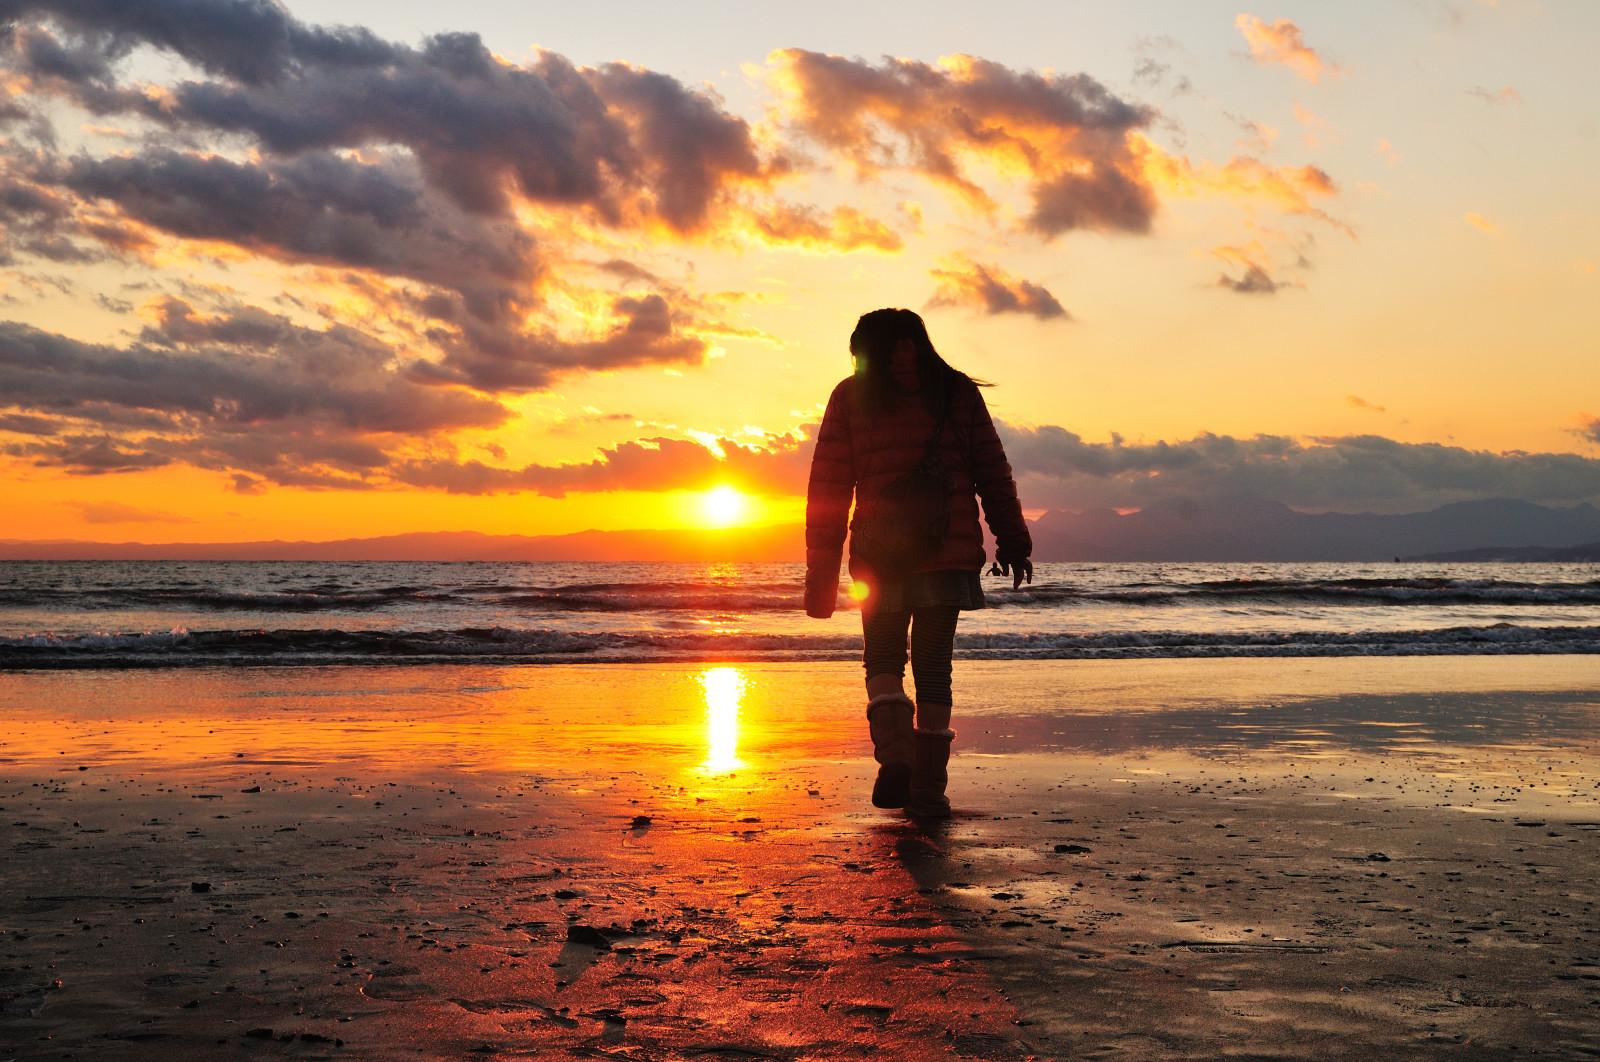 Wallpaper : sea, beach, light, sunset, people, walk, alone ...